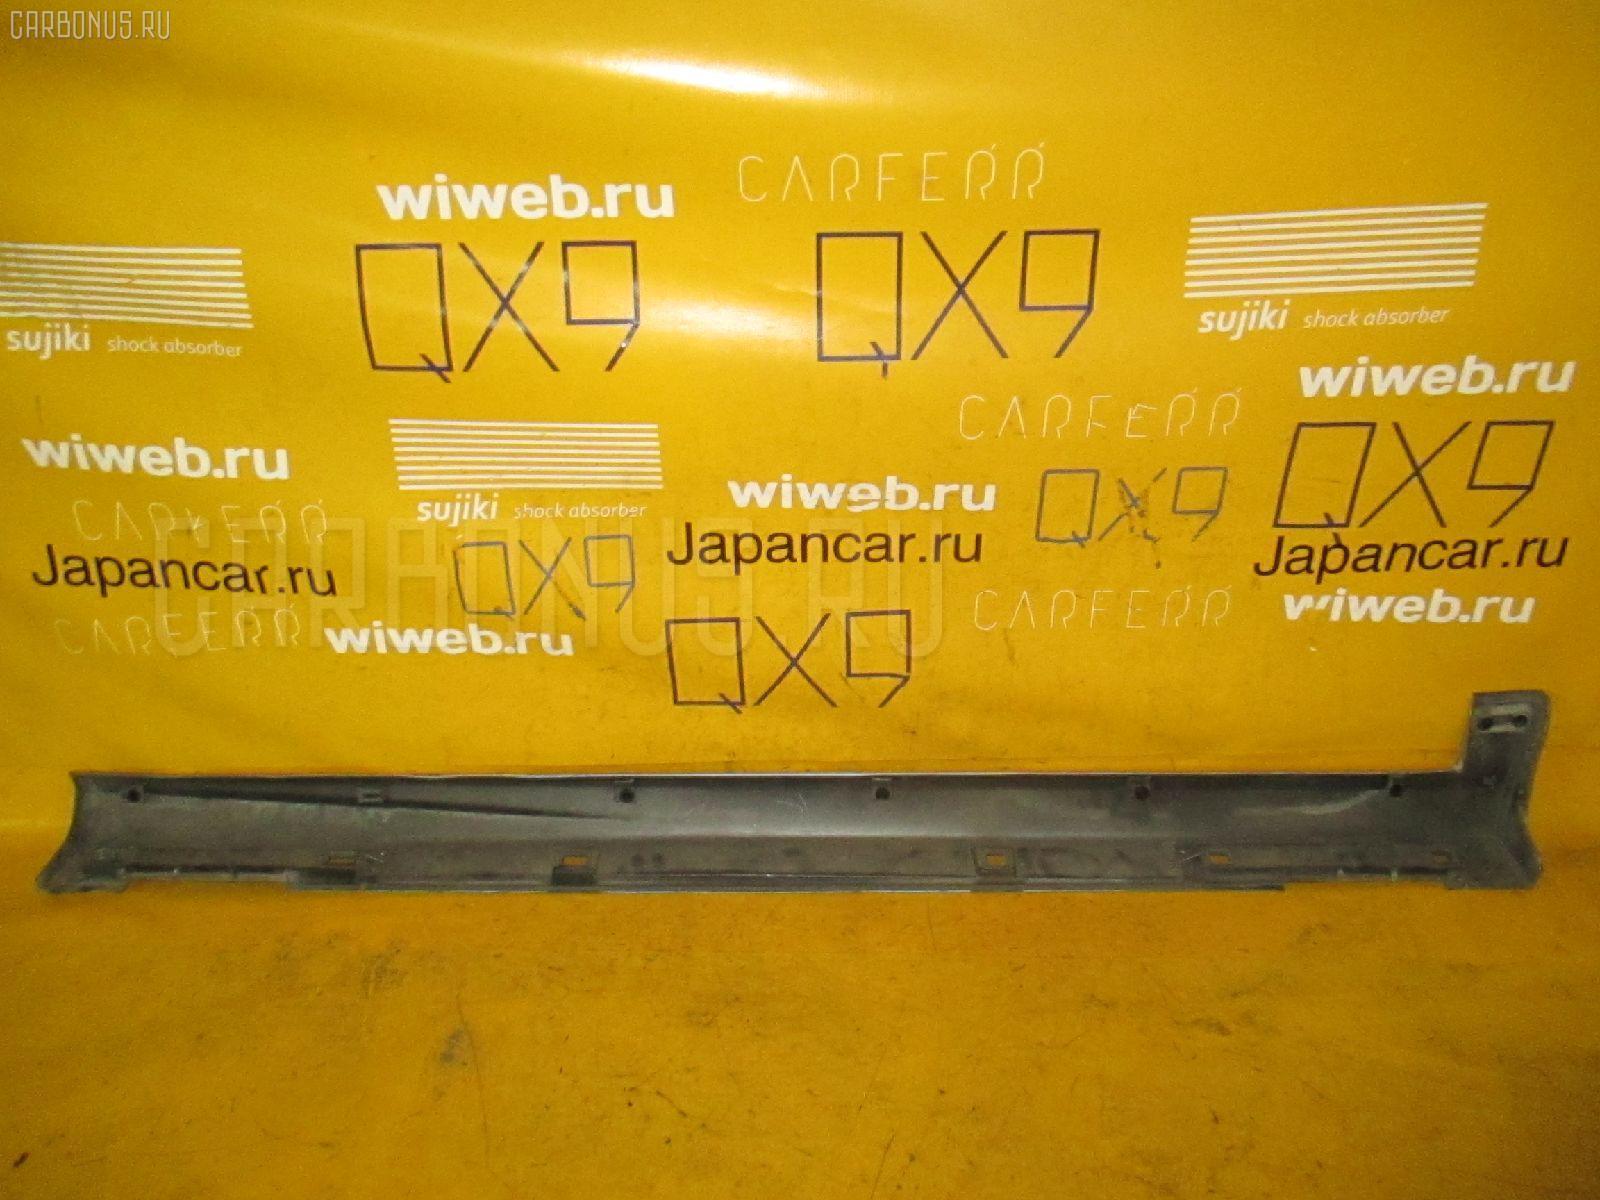 Порог кузова пластиковый ( обвес ) SUBARU IMPREZA WAGON GG2. Фото 1